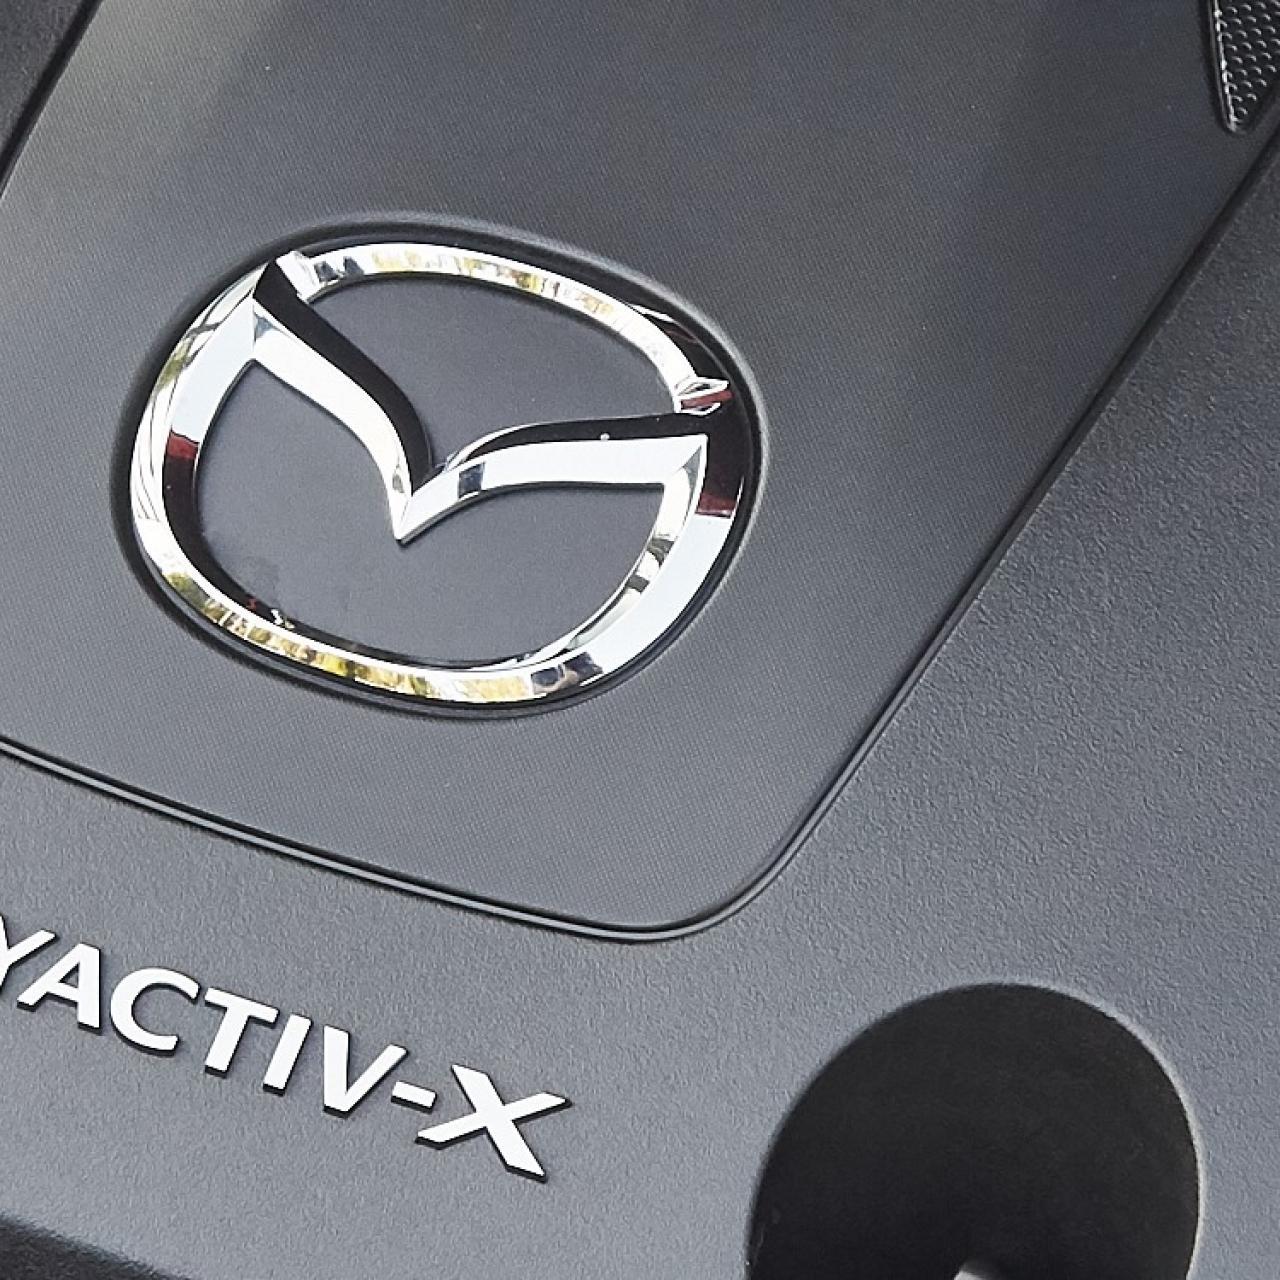 Mazda's Skyactiv-X engine lands in NZ